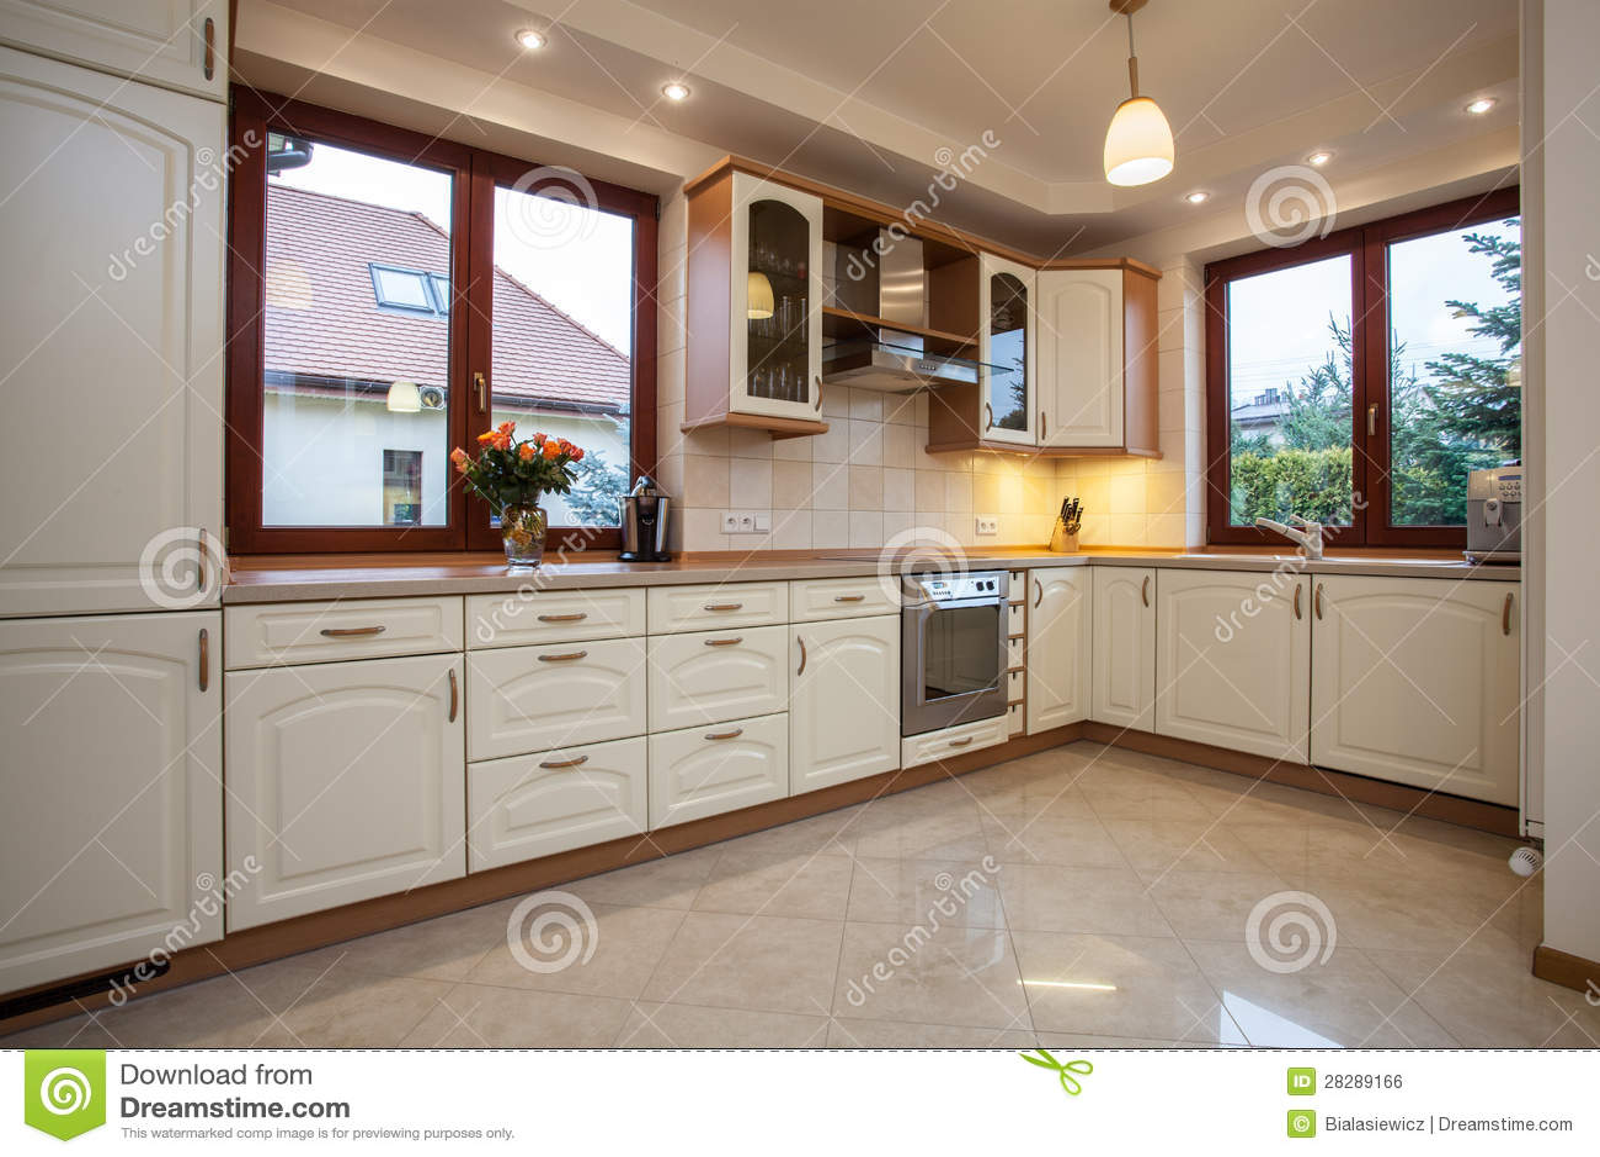 Beżowa Kuchnia Obraz Royalty Free  Obraz 28289166 -> Kuchnia Wloska Obrazy